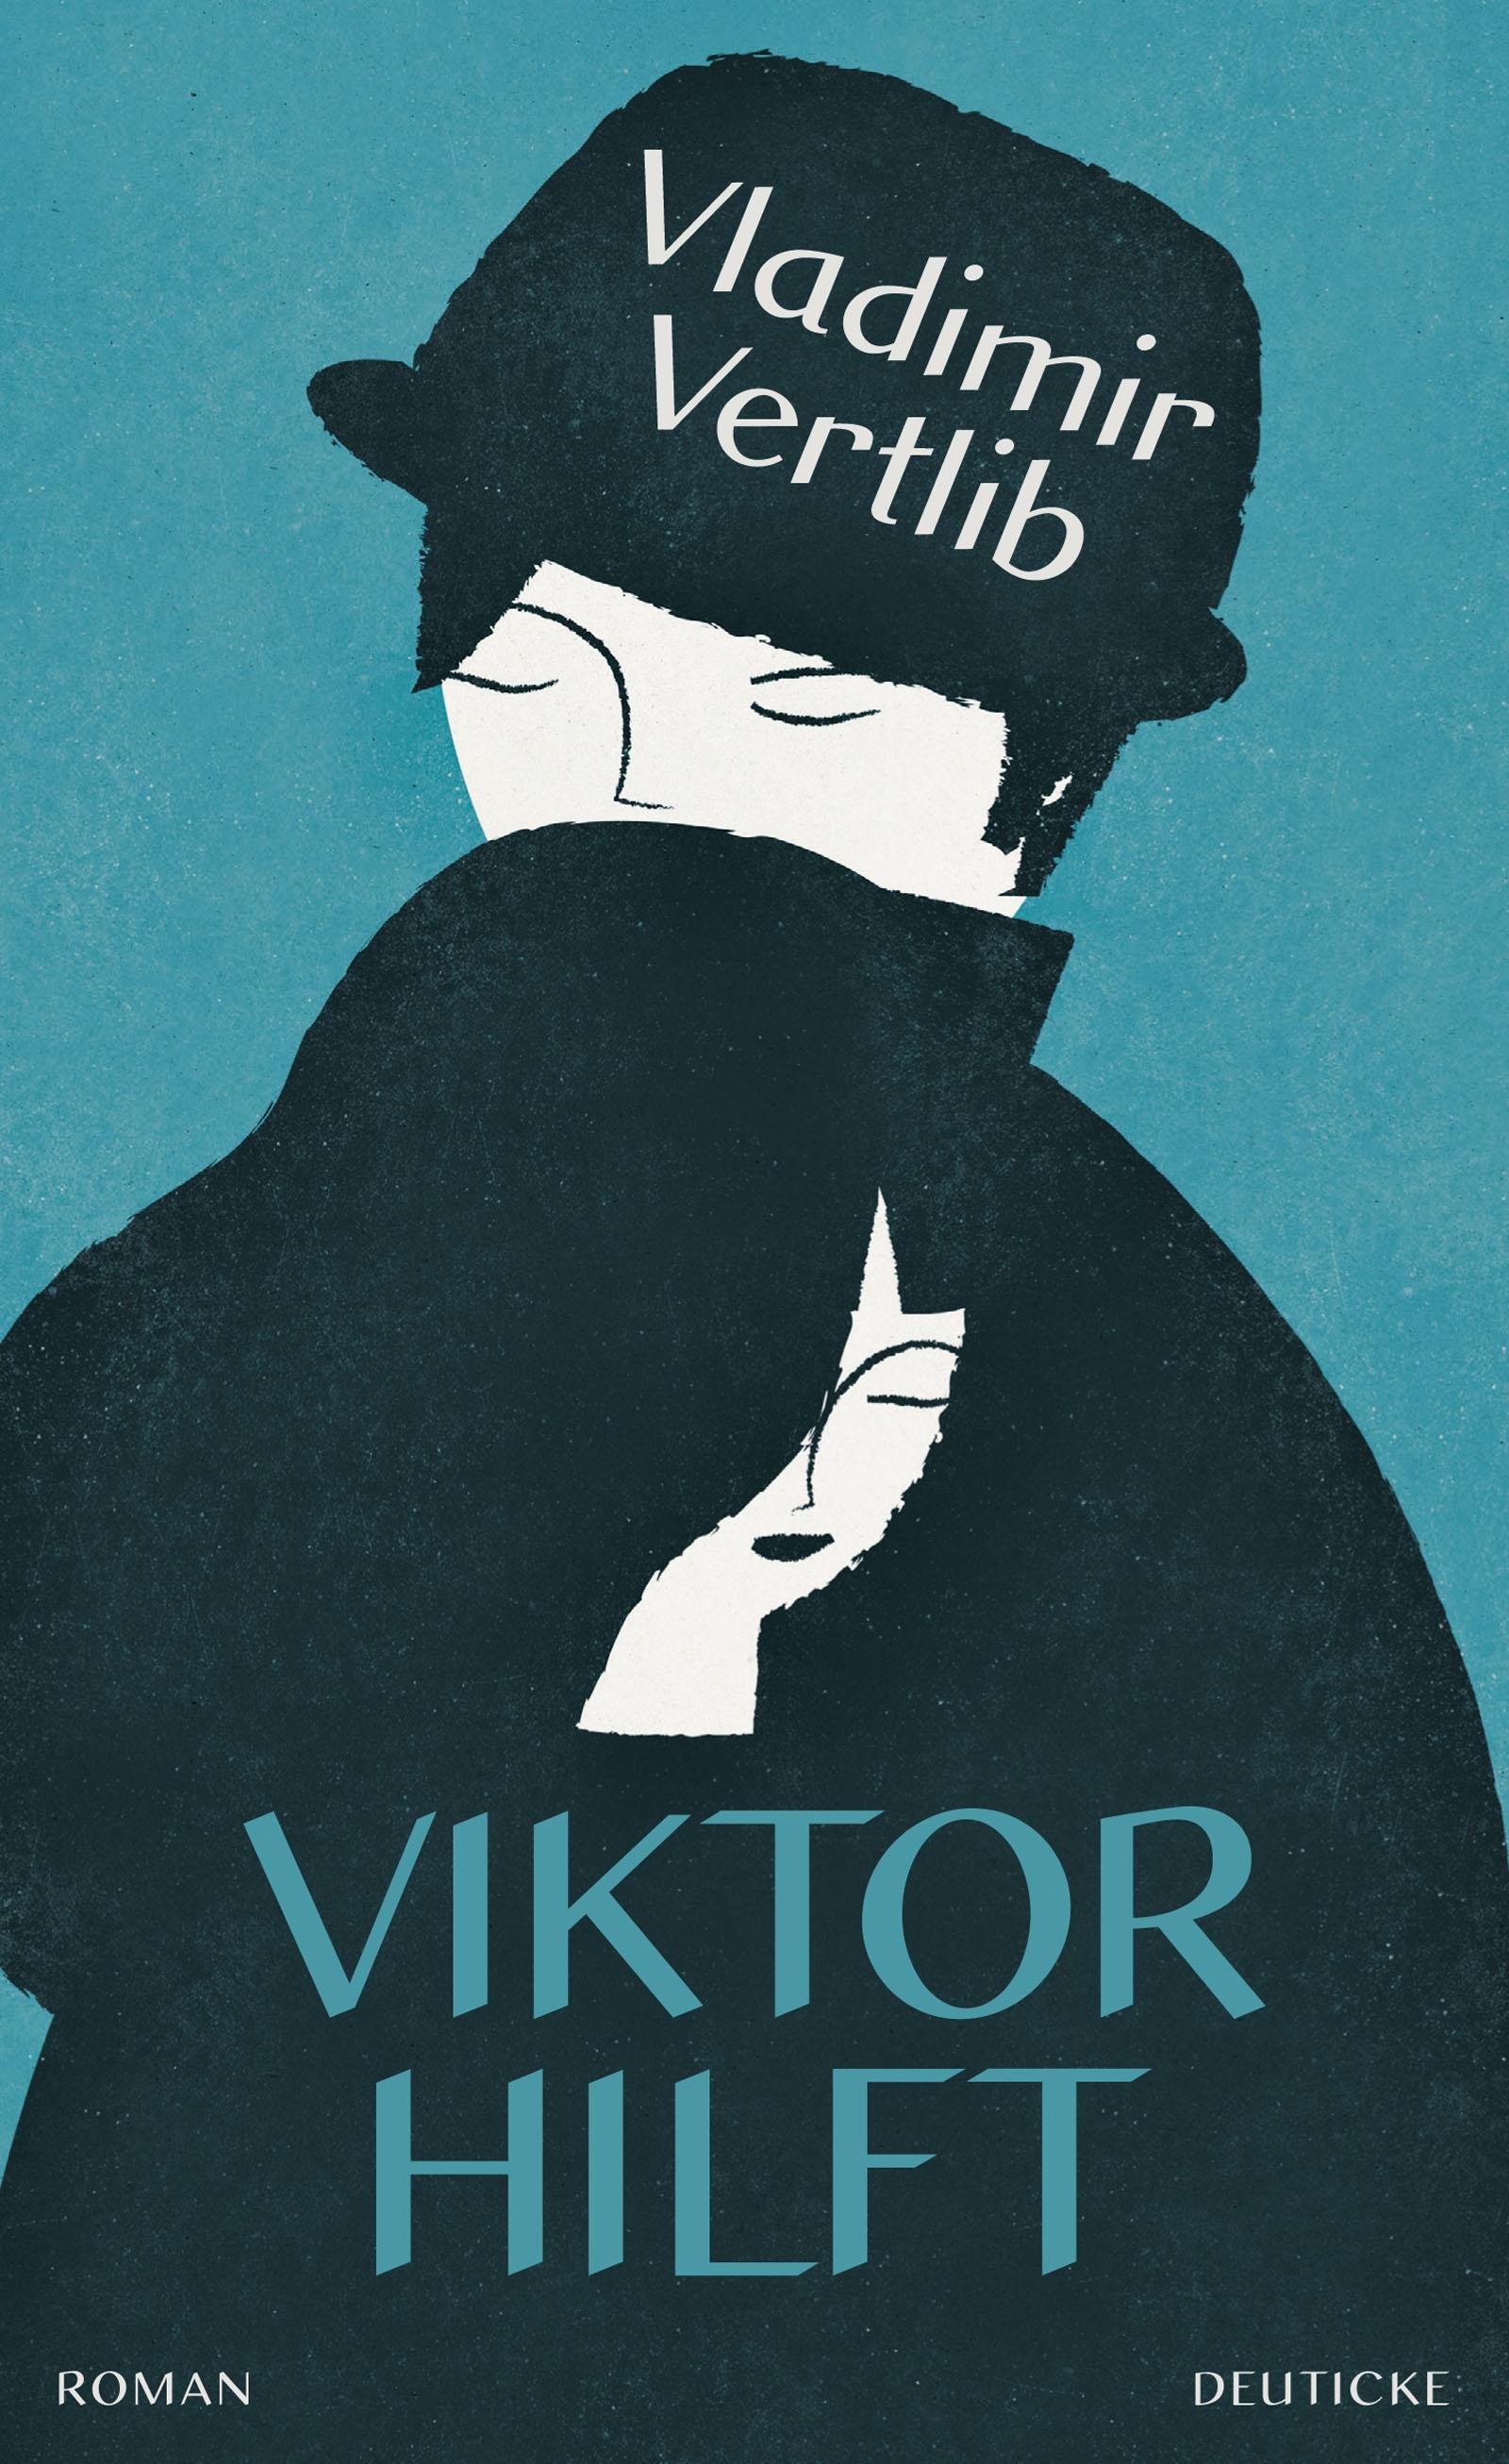 Viktor Helps